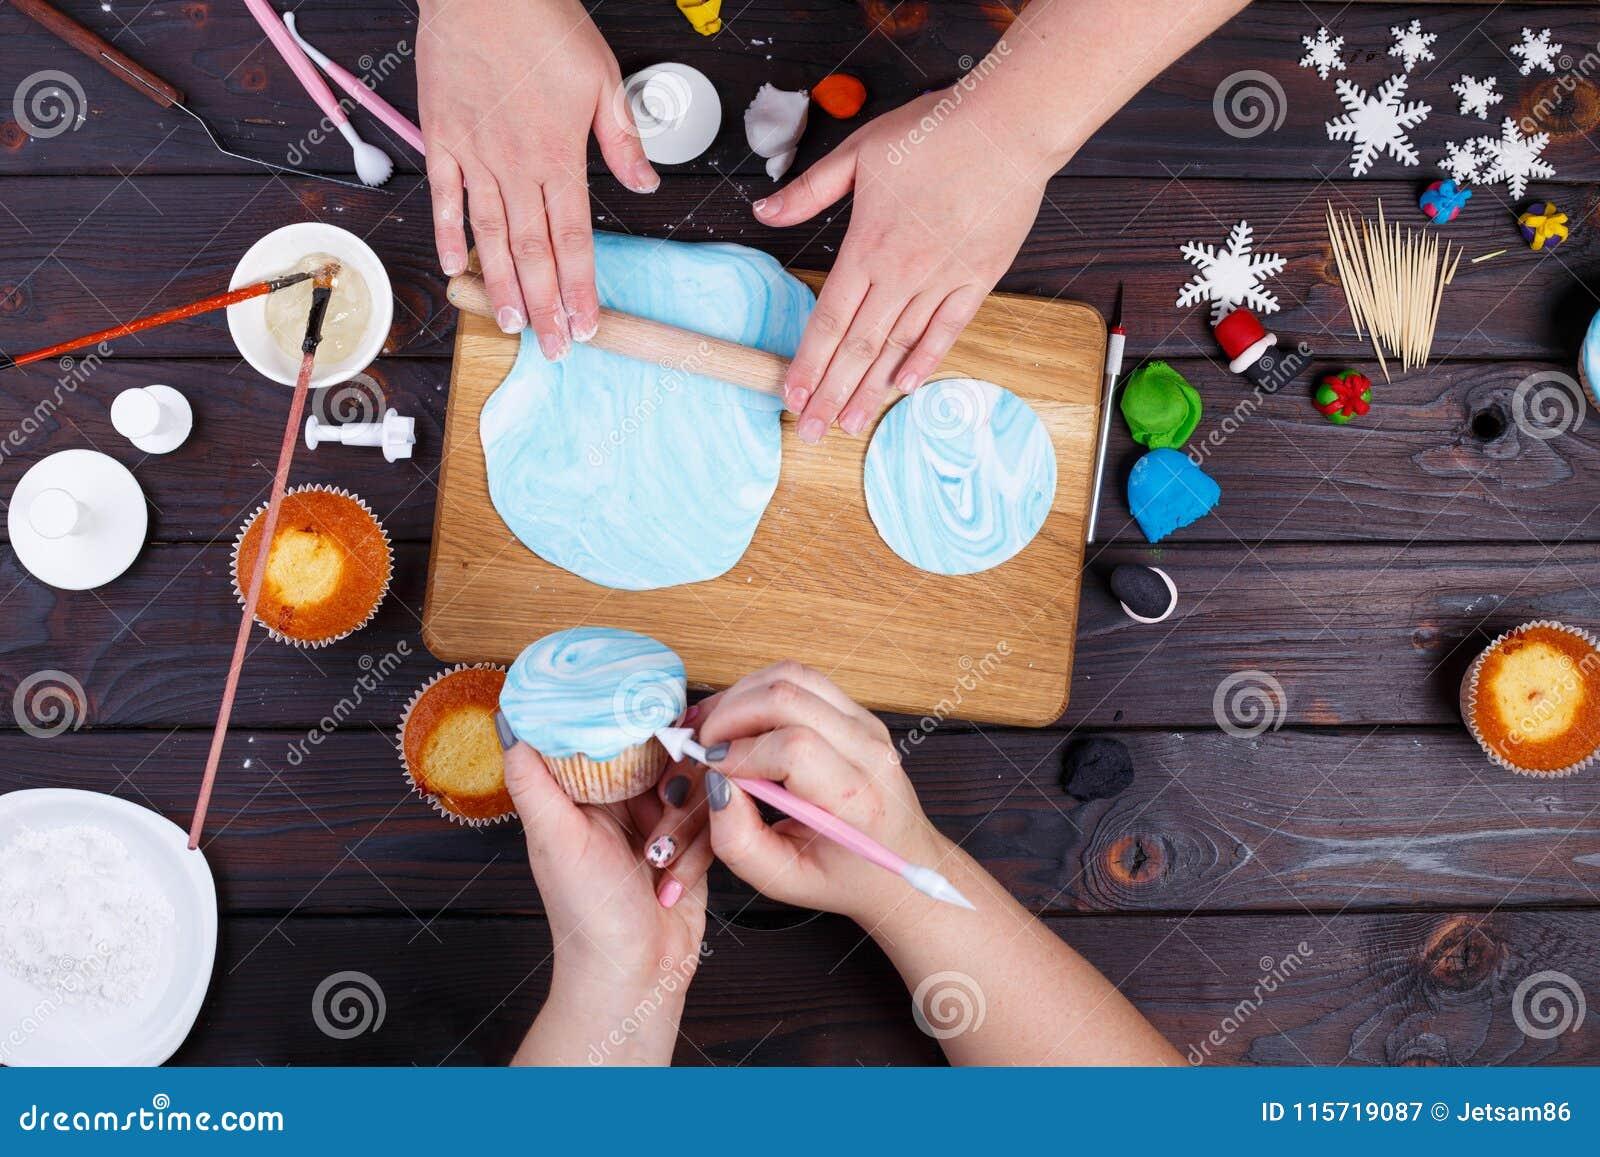 Amigos que rolam a mástique dos confeitos e que decoram os queques, vi